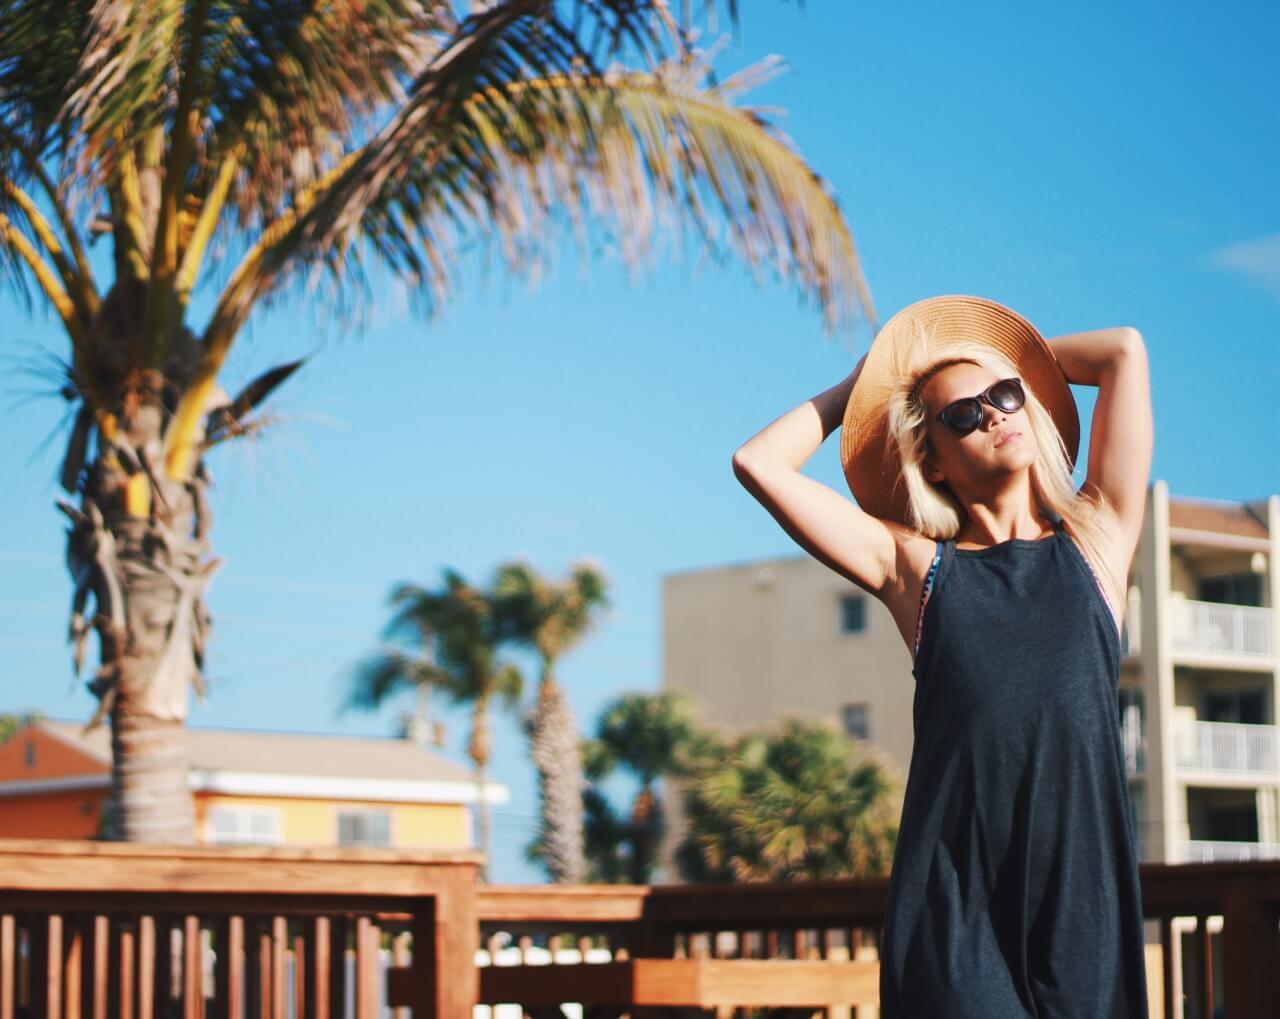 tumblr opc0mcWkrL1uqdy2lo2 1280 - Beach Tank Dress - The Perfect Dress for Summer